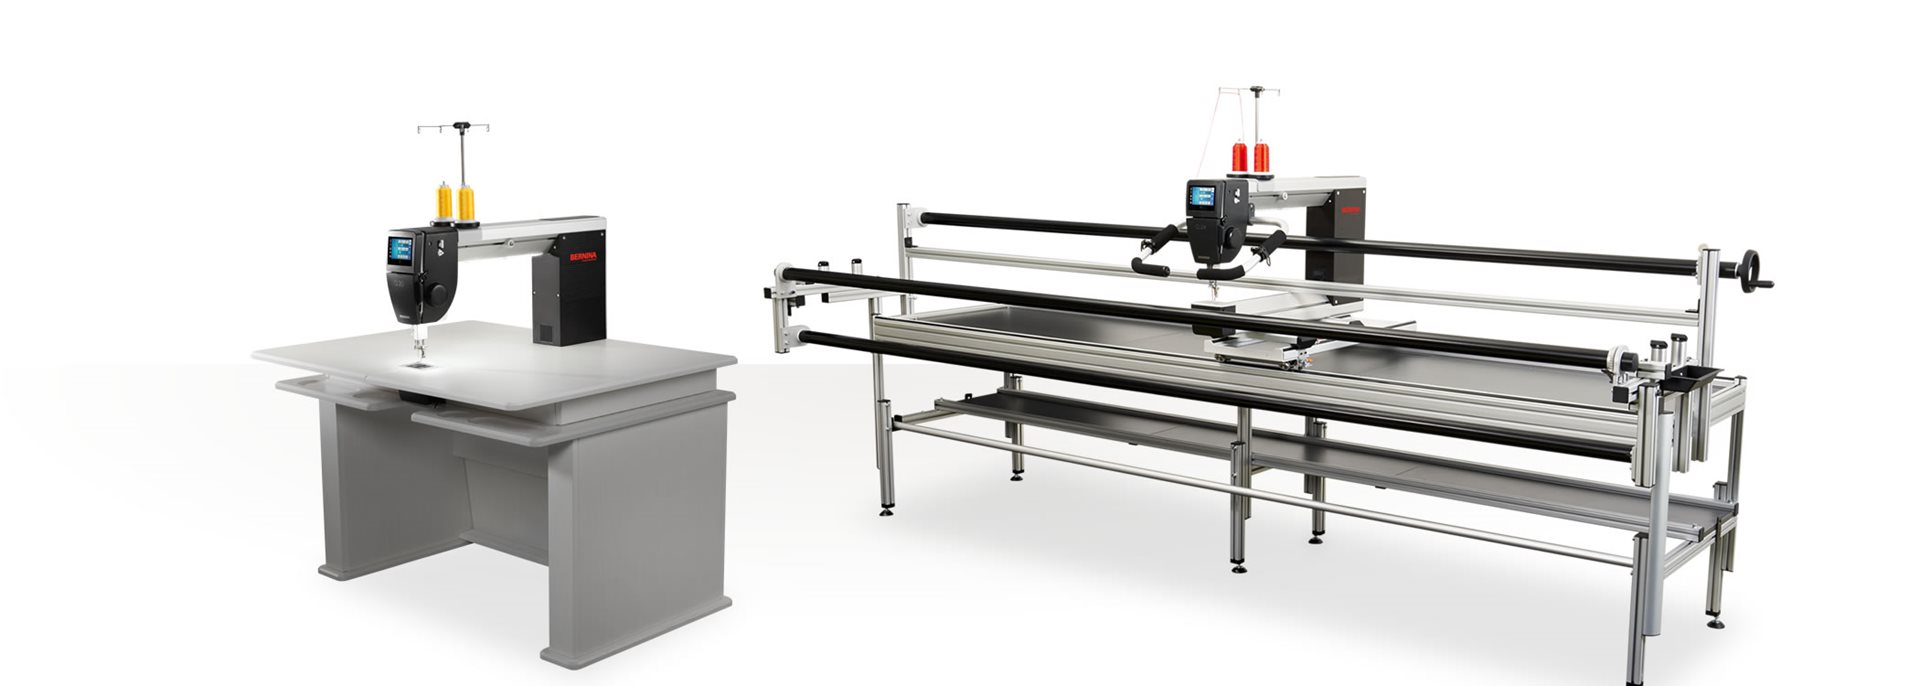 BERNINA & Cupcakes : small long arm quilting machines - Adamdwight.com